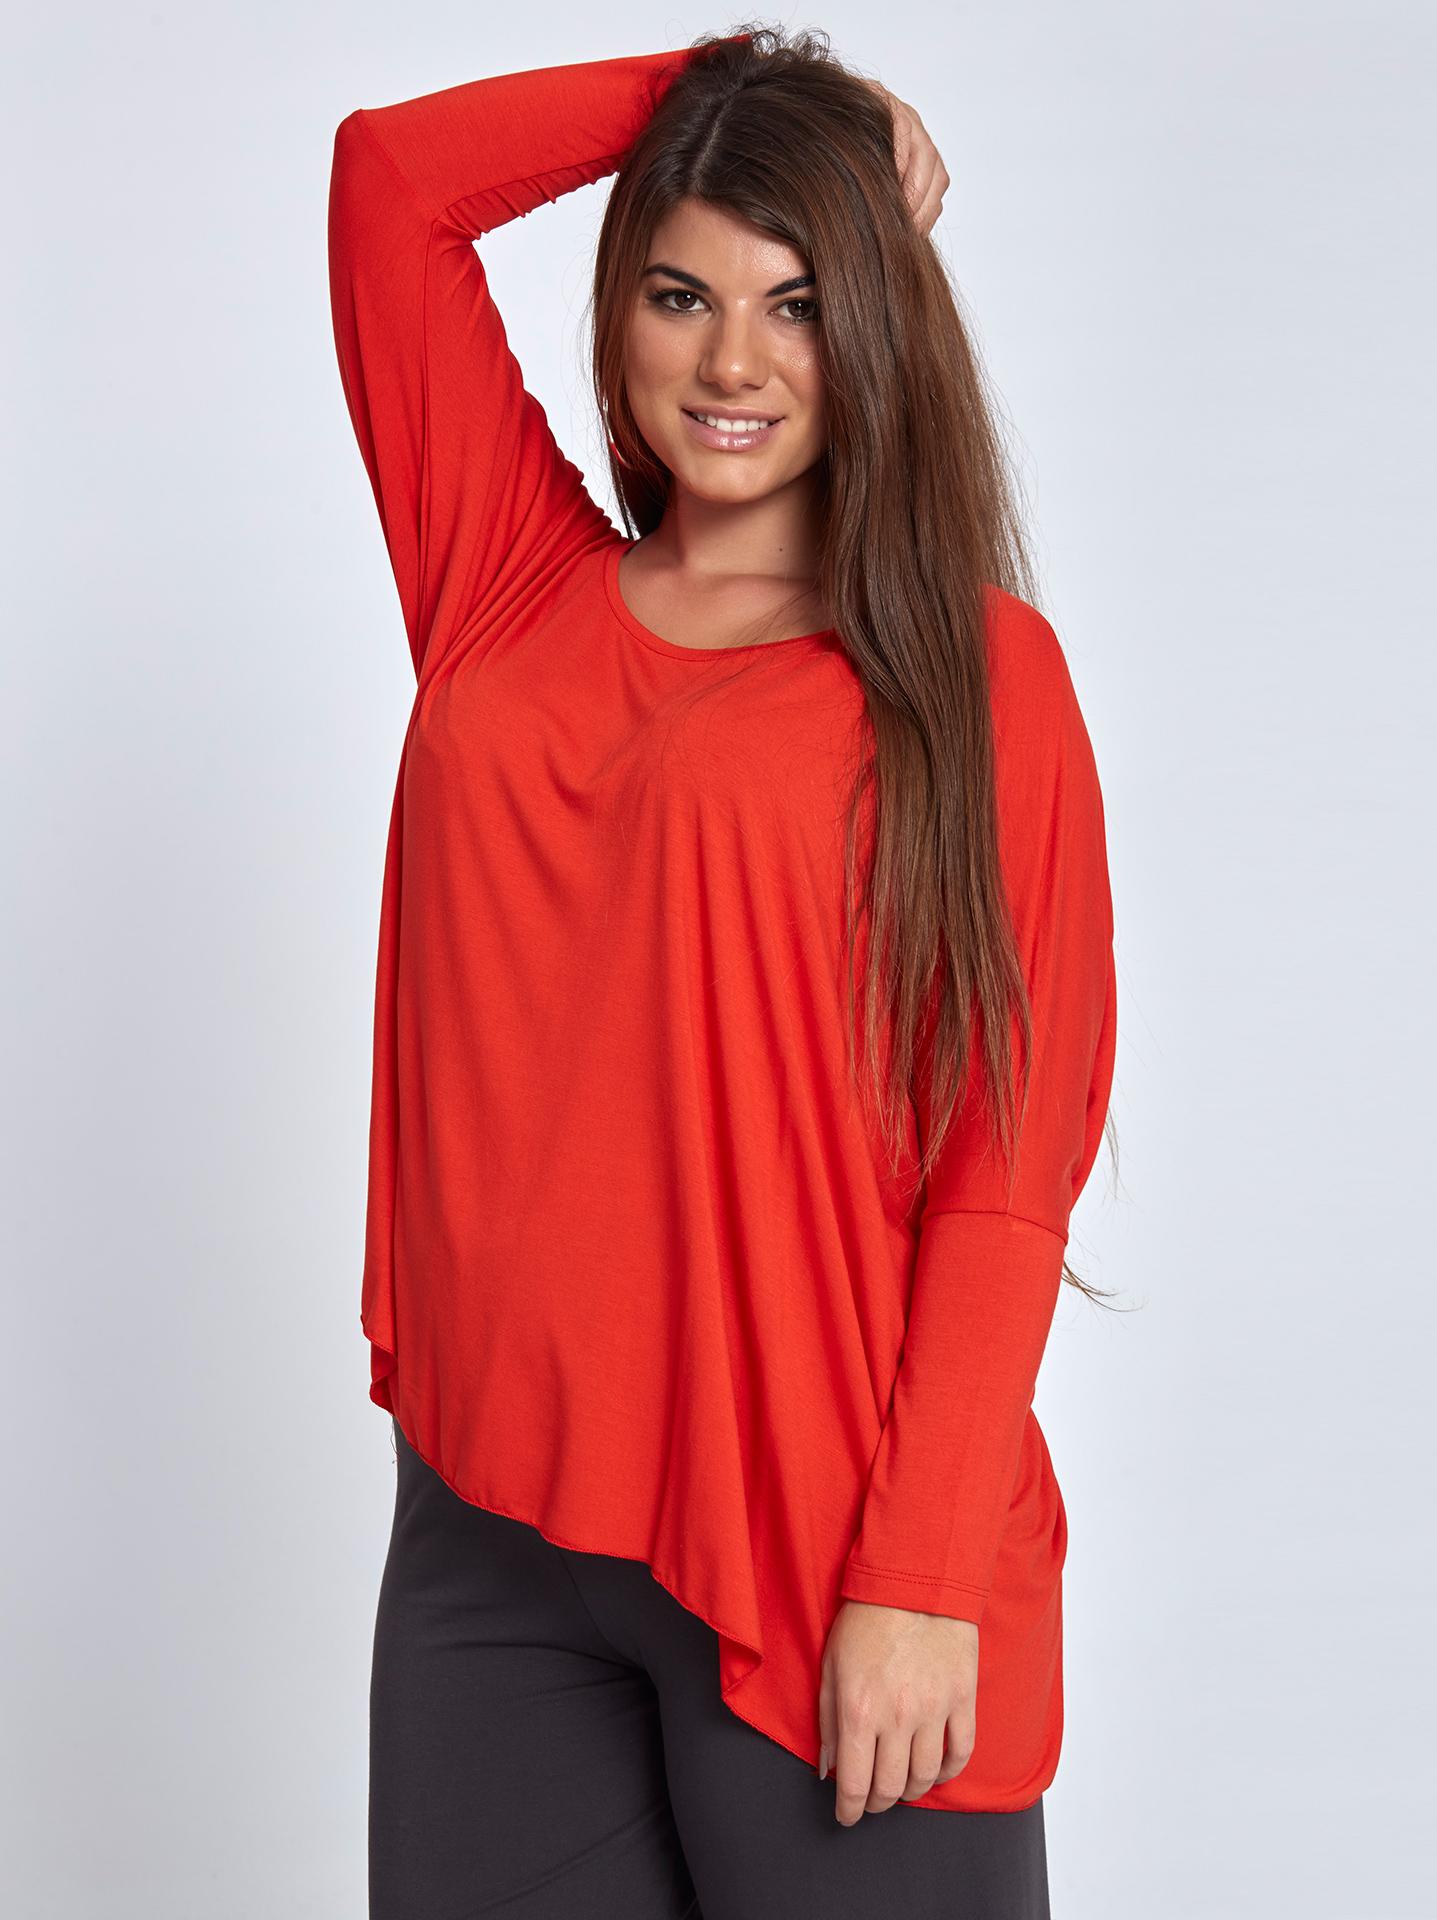 da7add07e5df Μακρυμάνικη μακριά μπλούζα curvy σε κοκκινο ανοιχτο